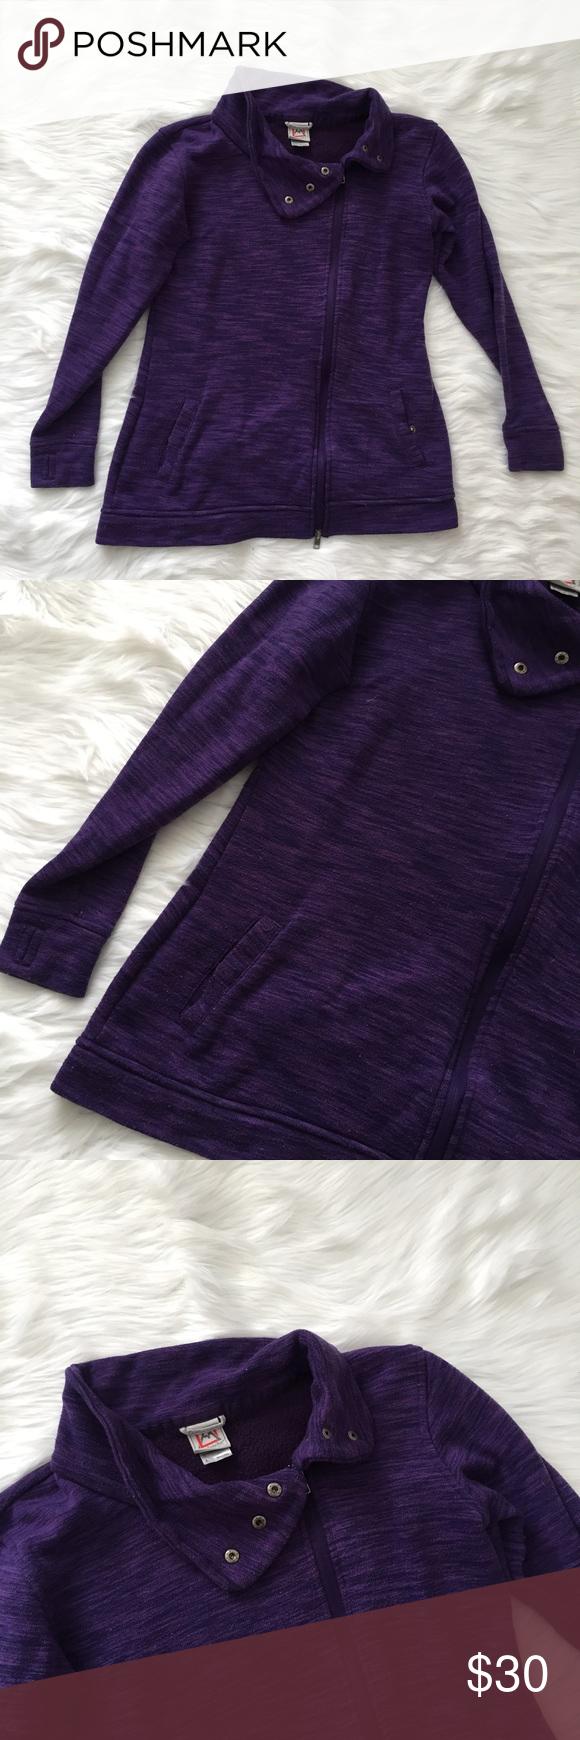 Avalanche purple asymmetrical zip fleece jacket smoke free